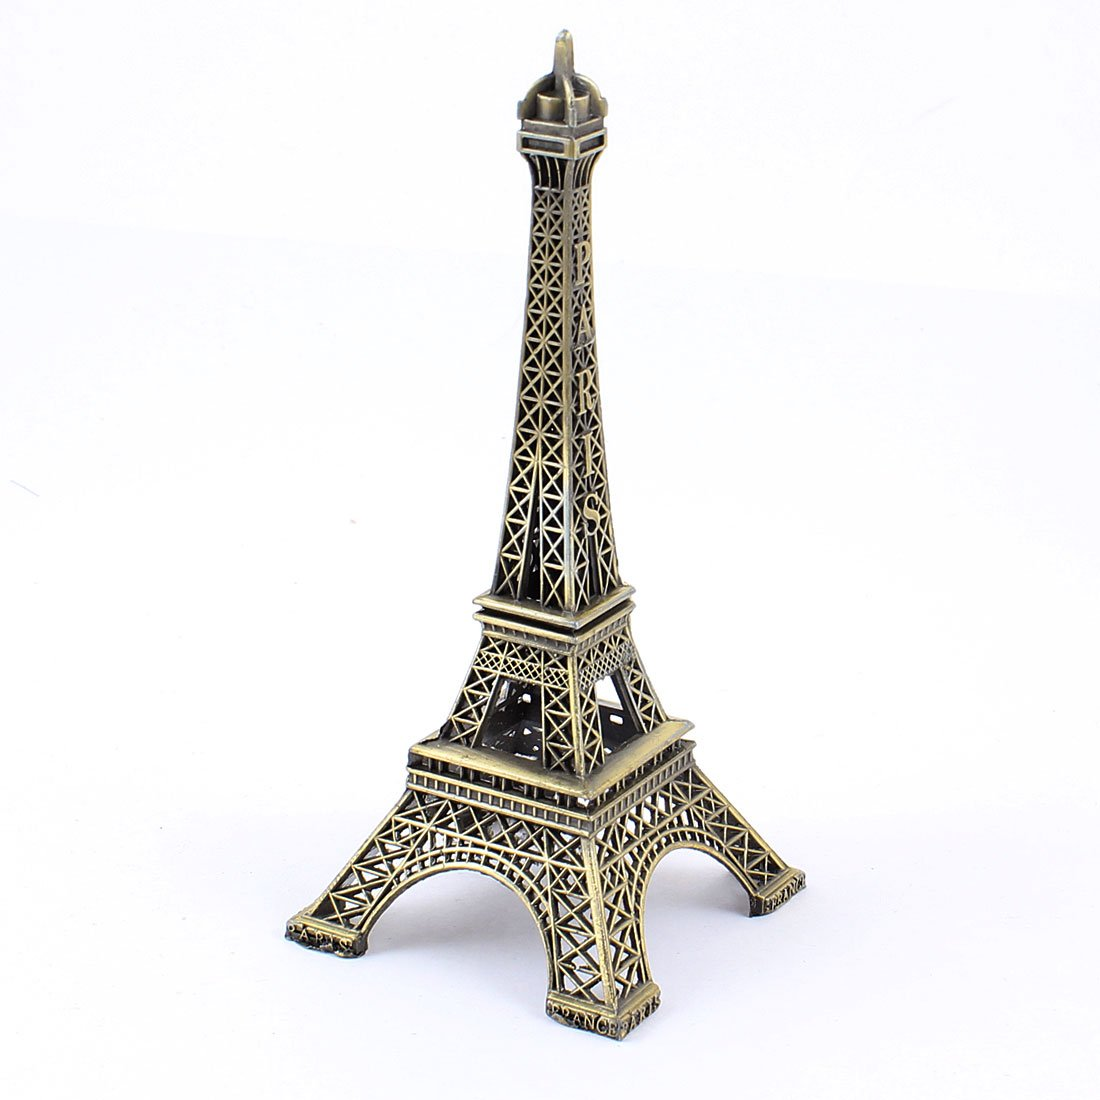 Metallic eiffel tower home decor 13cm paris bronze tone for Eiffel tower decorations for the home